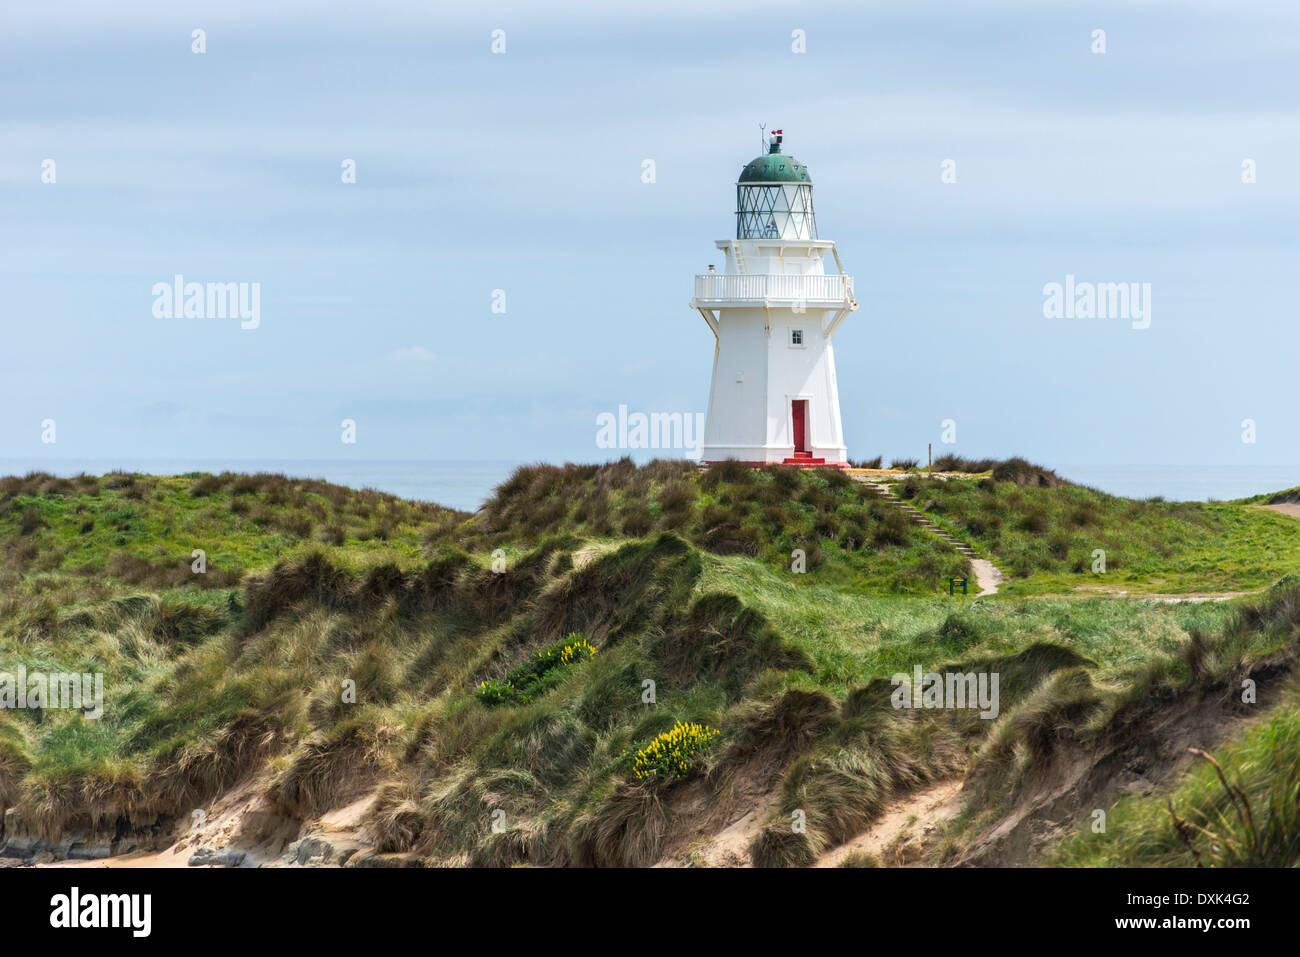 Faro, Waikawa punto, Nuova Zelanda Immagini Stock